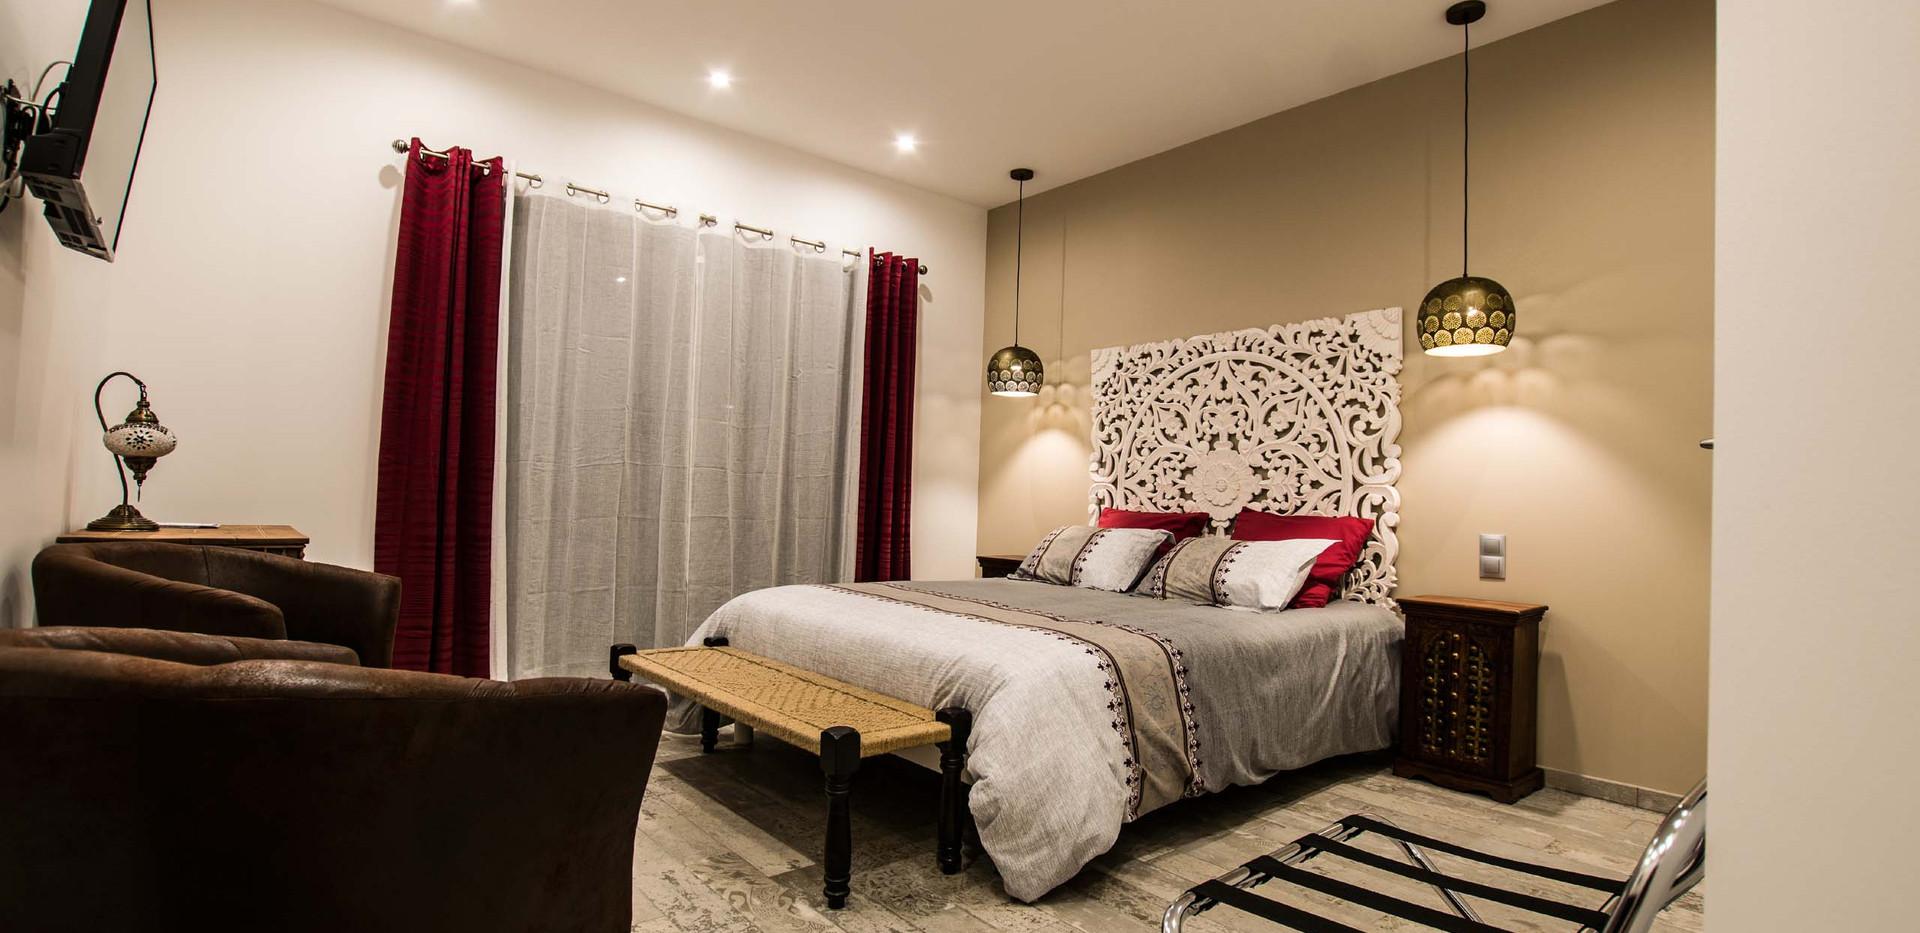 23m2 de confort pour la chambre New Delhi